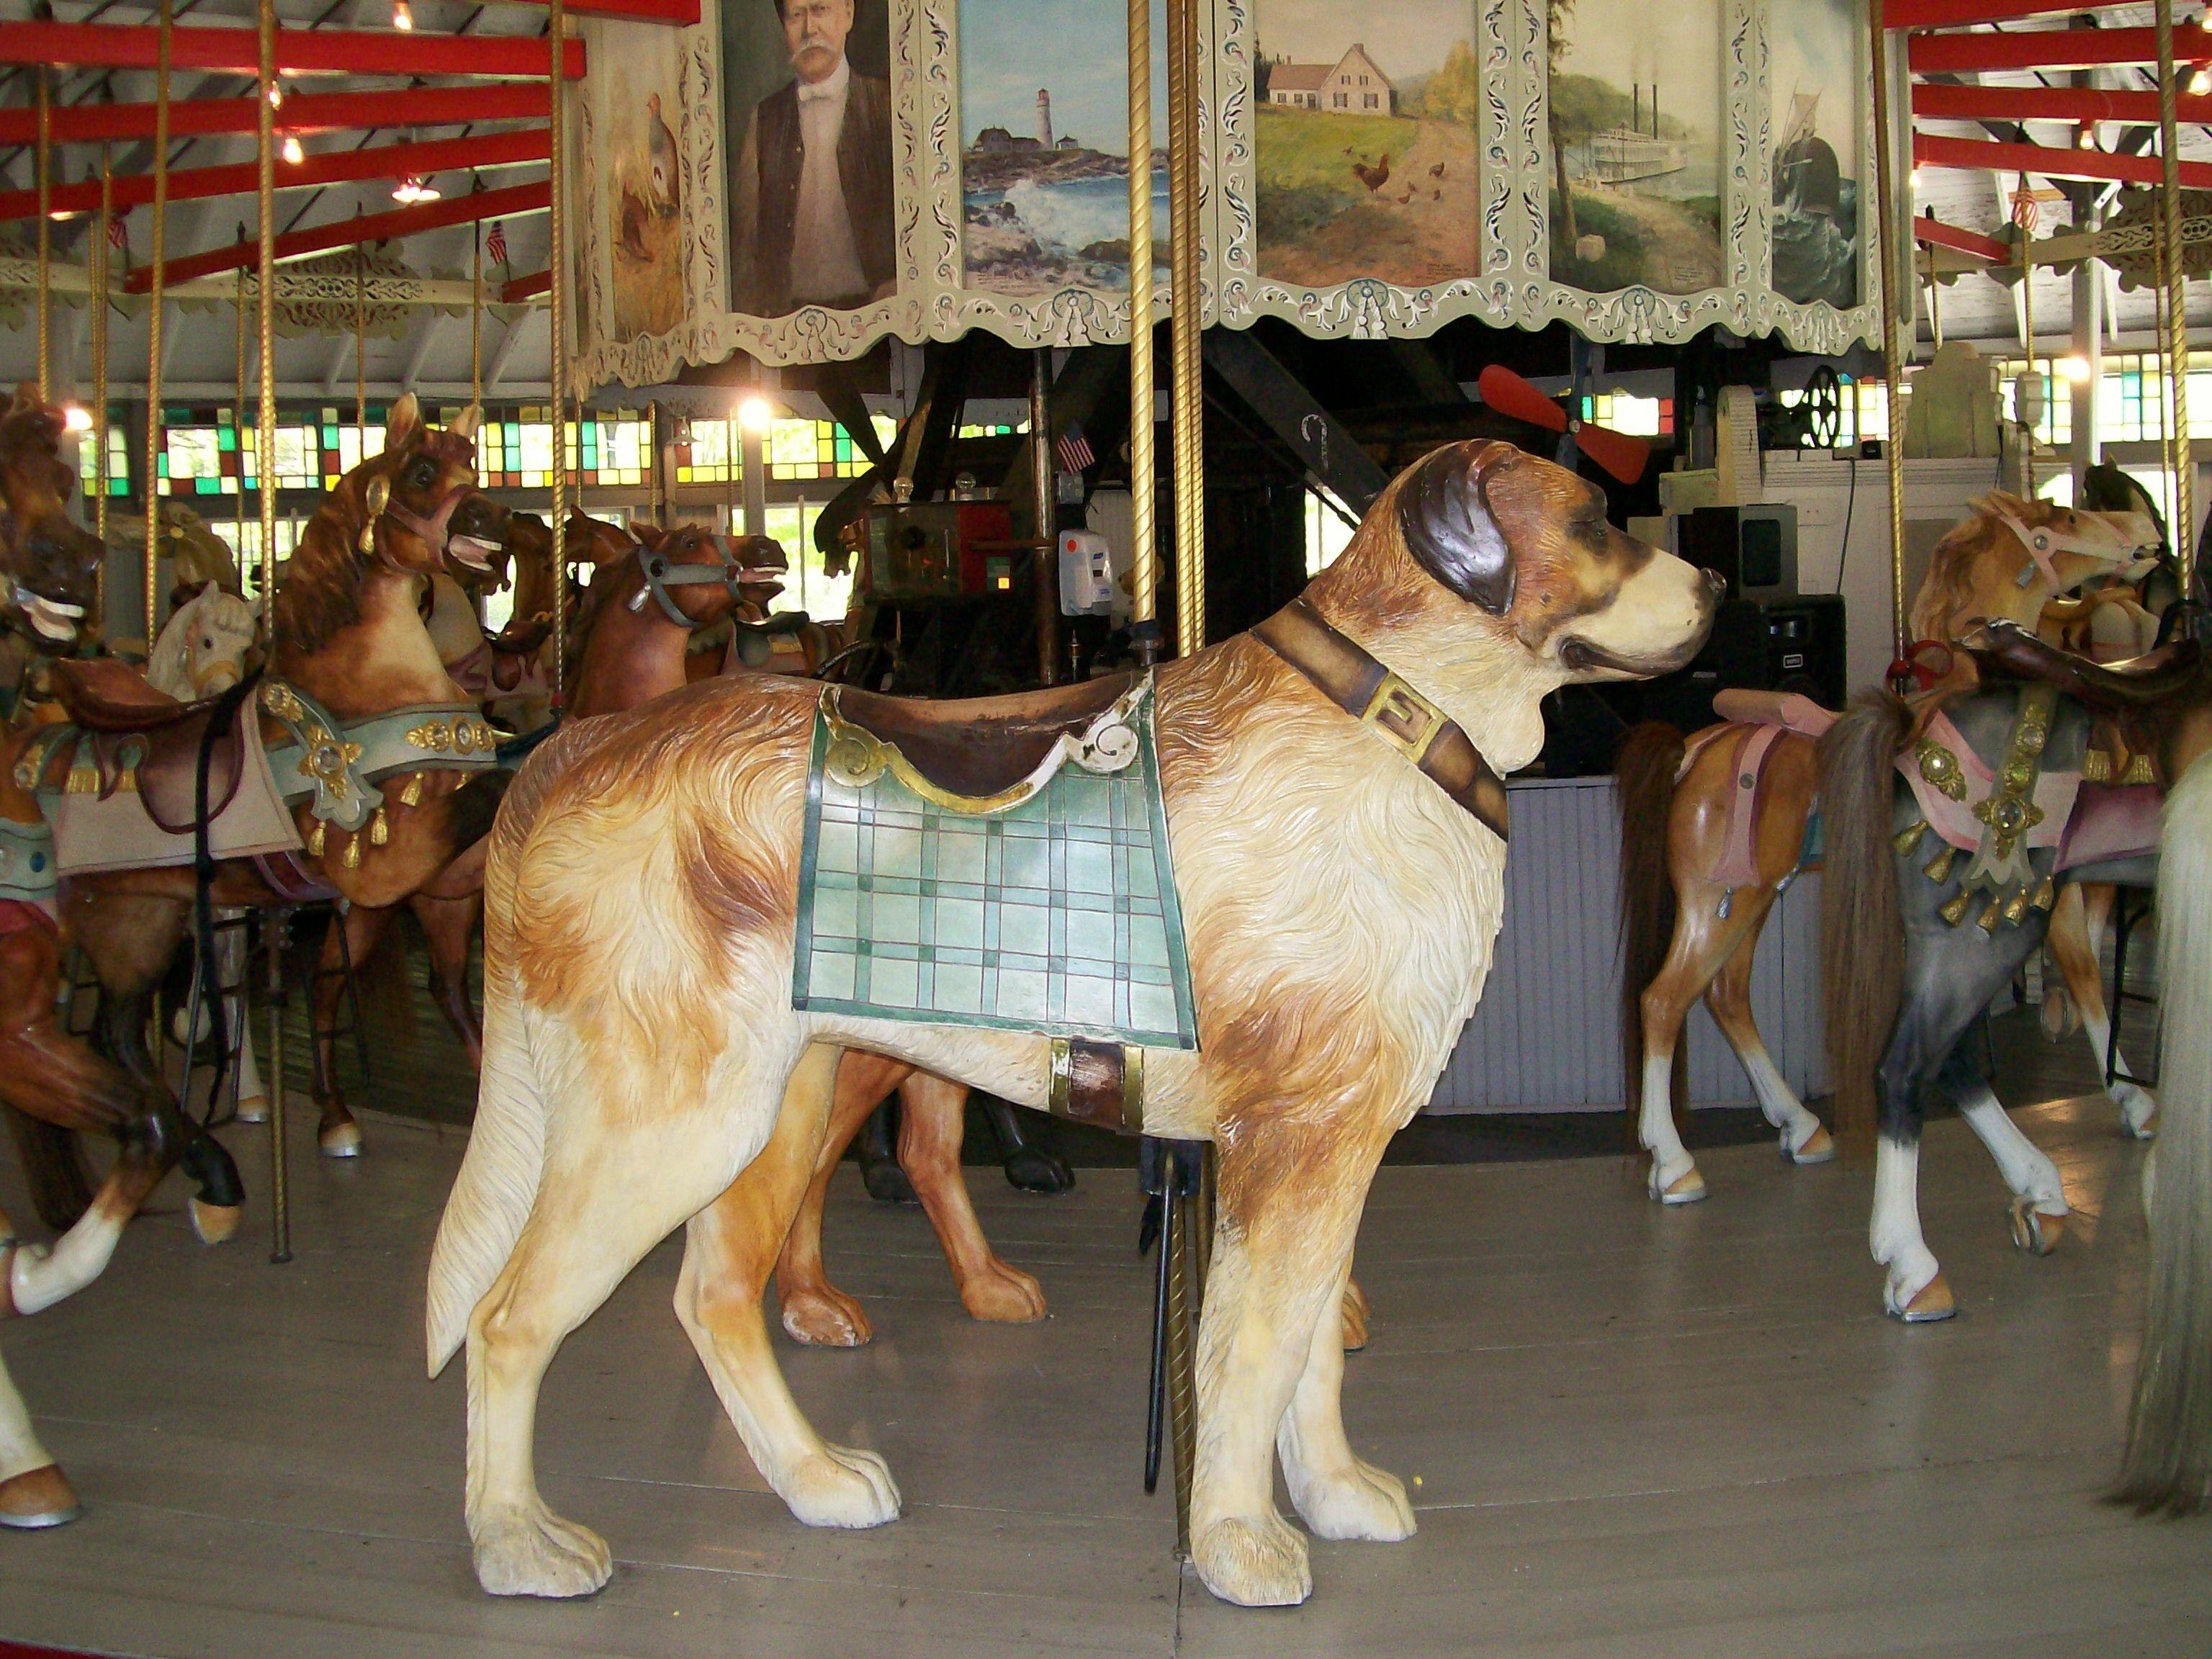 National carousel association denver zoo carousel african wild dog - Carousel Dog Riverside Rhode Island Ridecolorfully